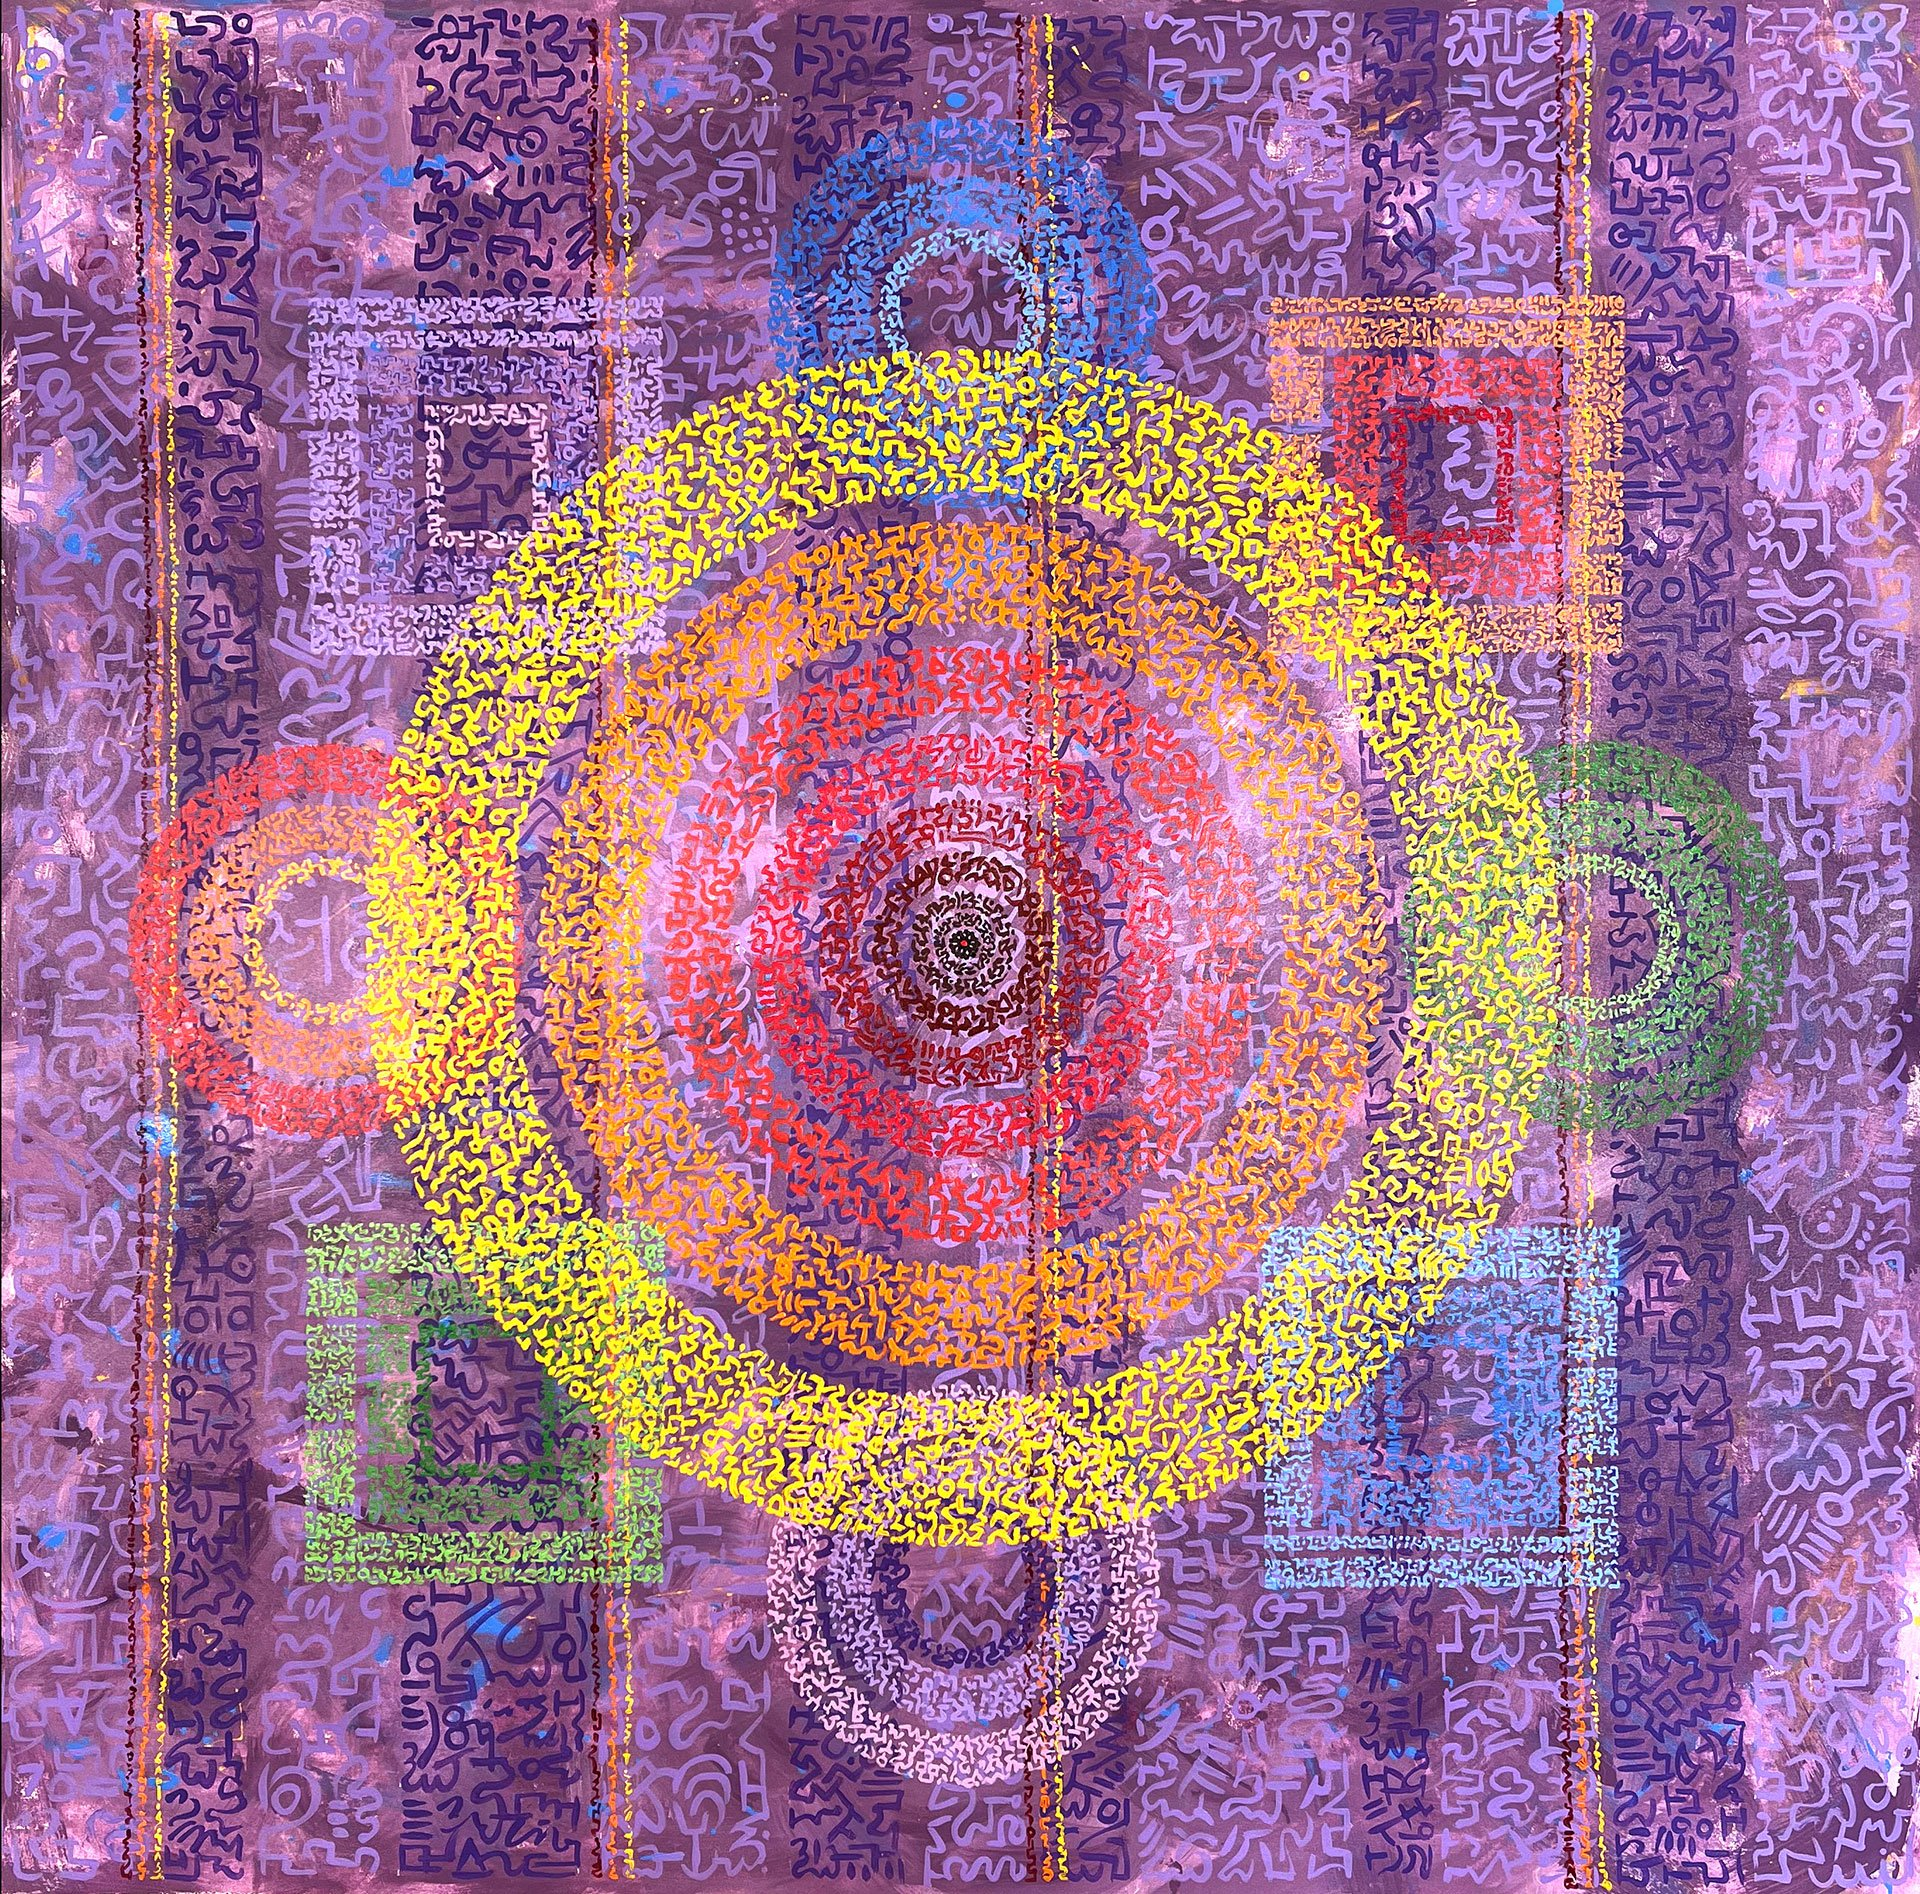 carlos-grasso_mind-tapestry-7